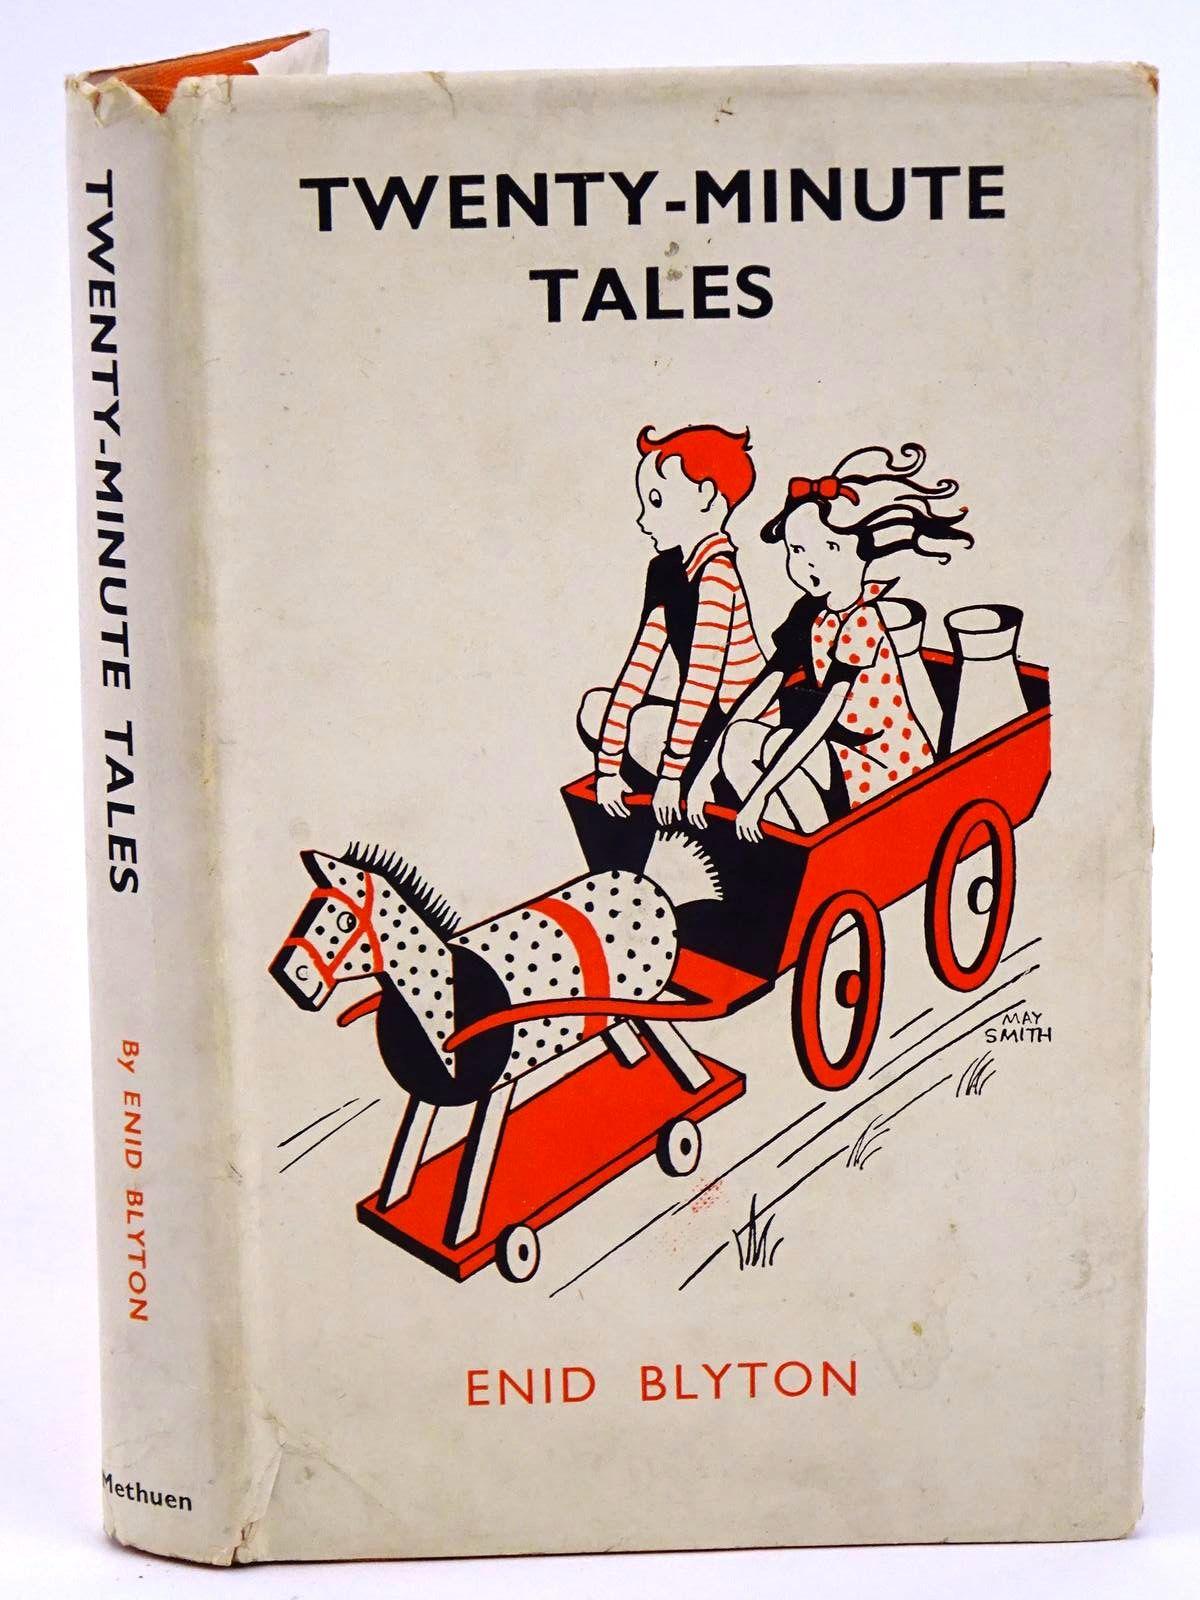 Photo of TWENTY-MINUTE TALES written by Blyton, Enid published by Methuen & Co. Ltd. (STOCK CODE: 1318206)  for sale by Stella & Rose's Books